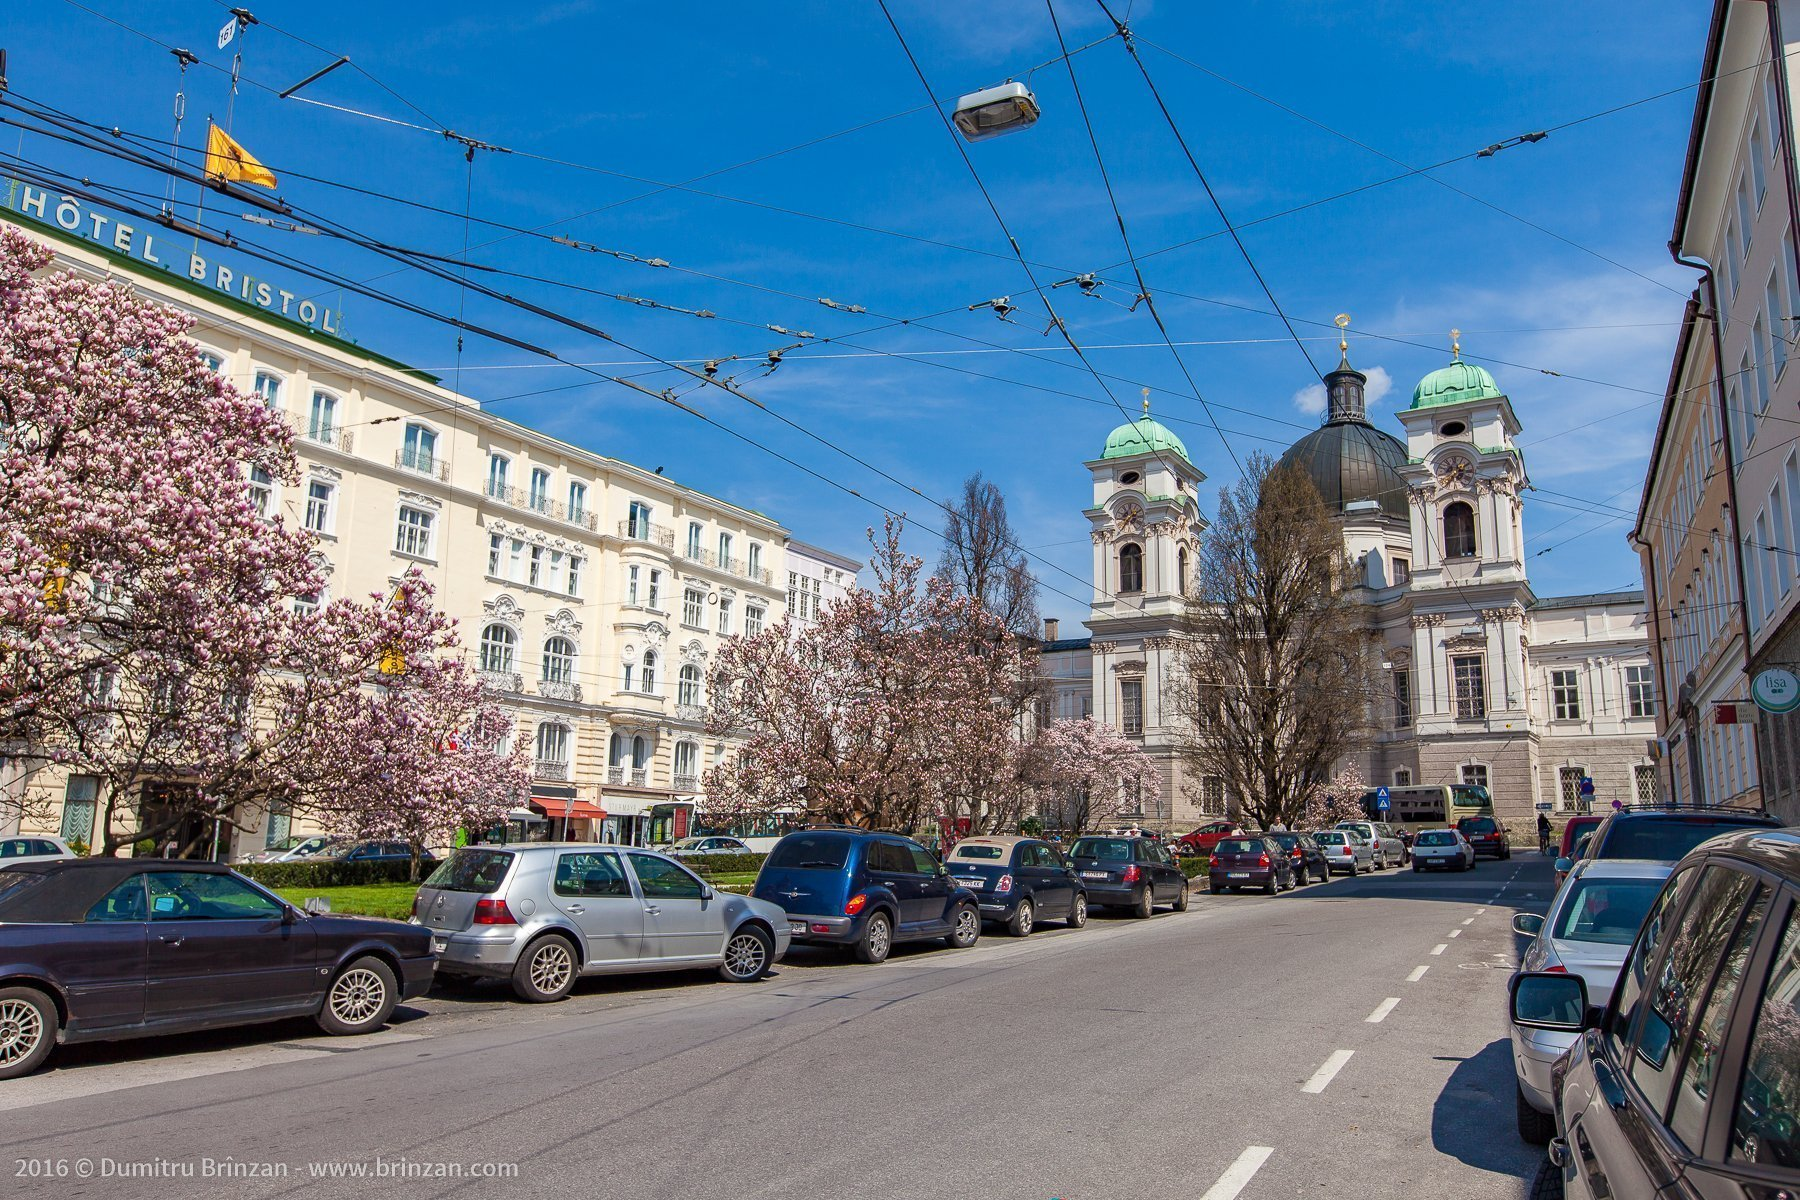 salzburg-austria-2013-1